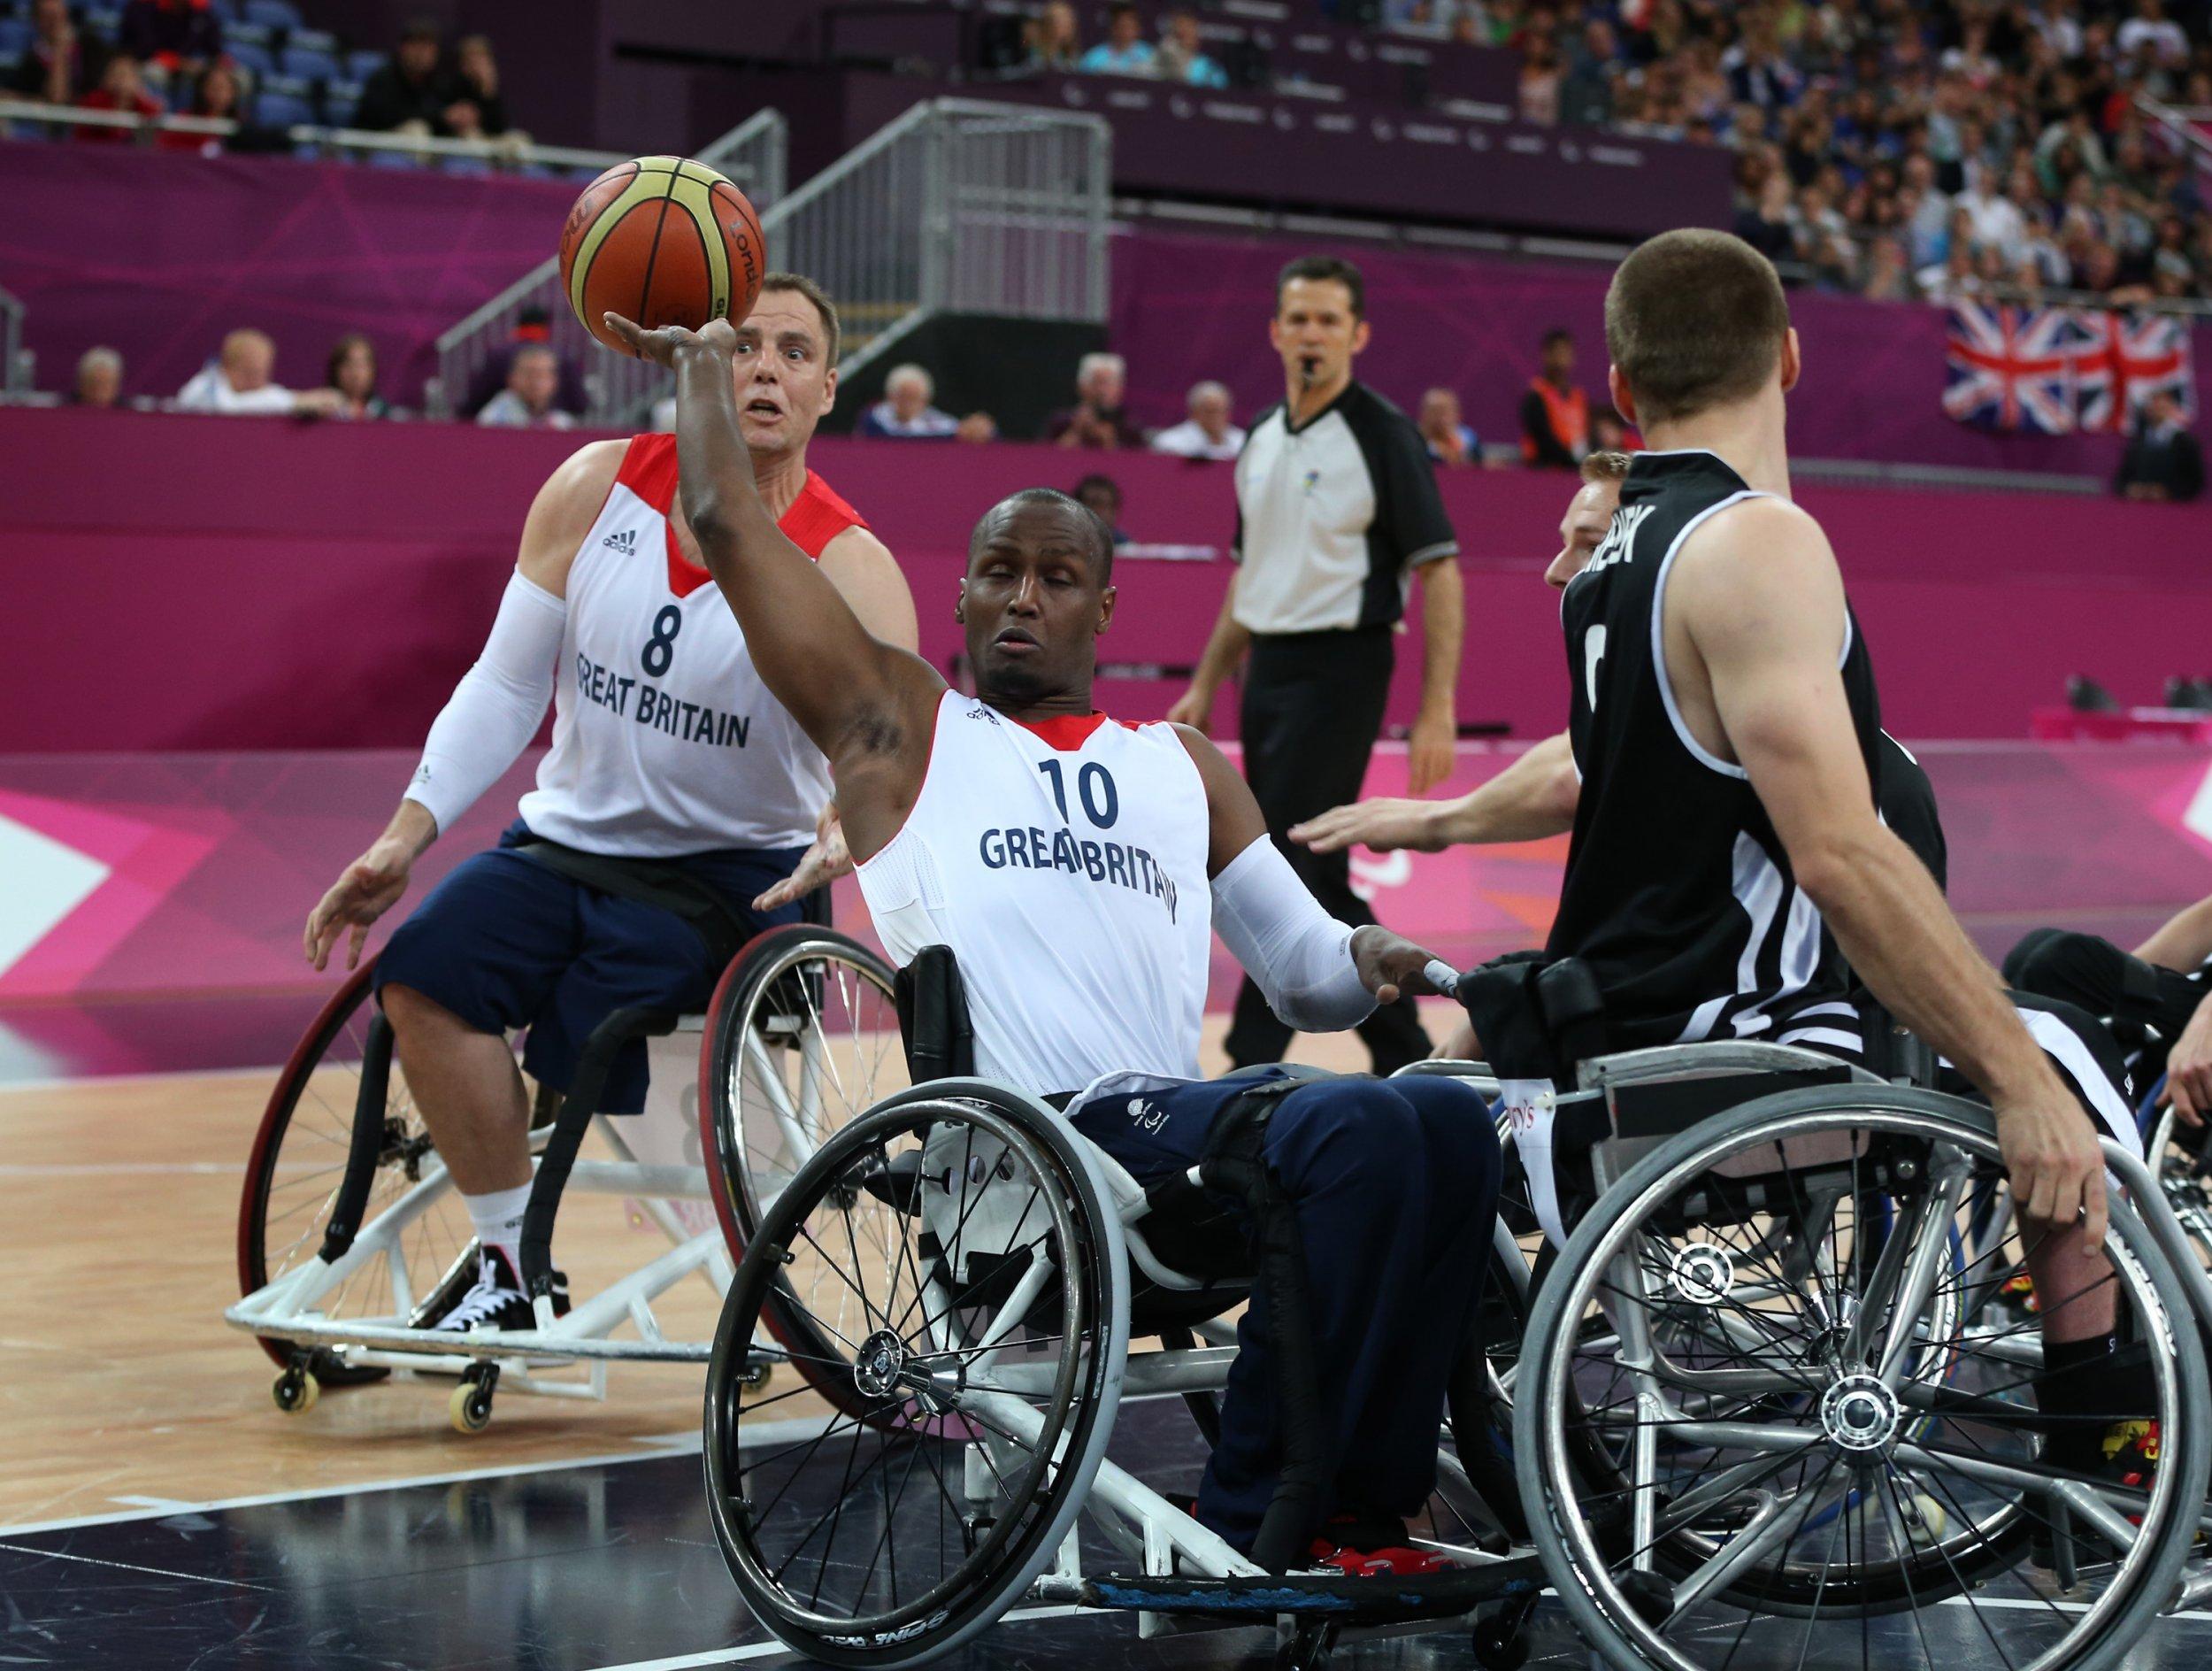 Abdi Jama at the London 2012 Paralympics